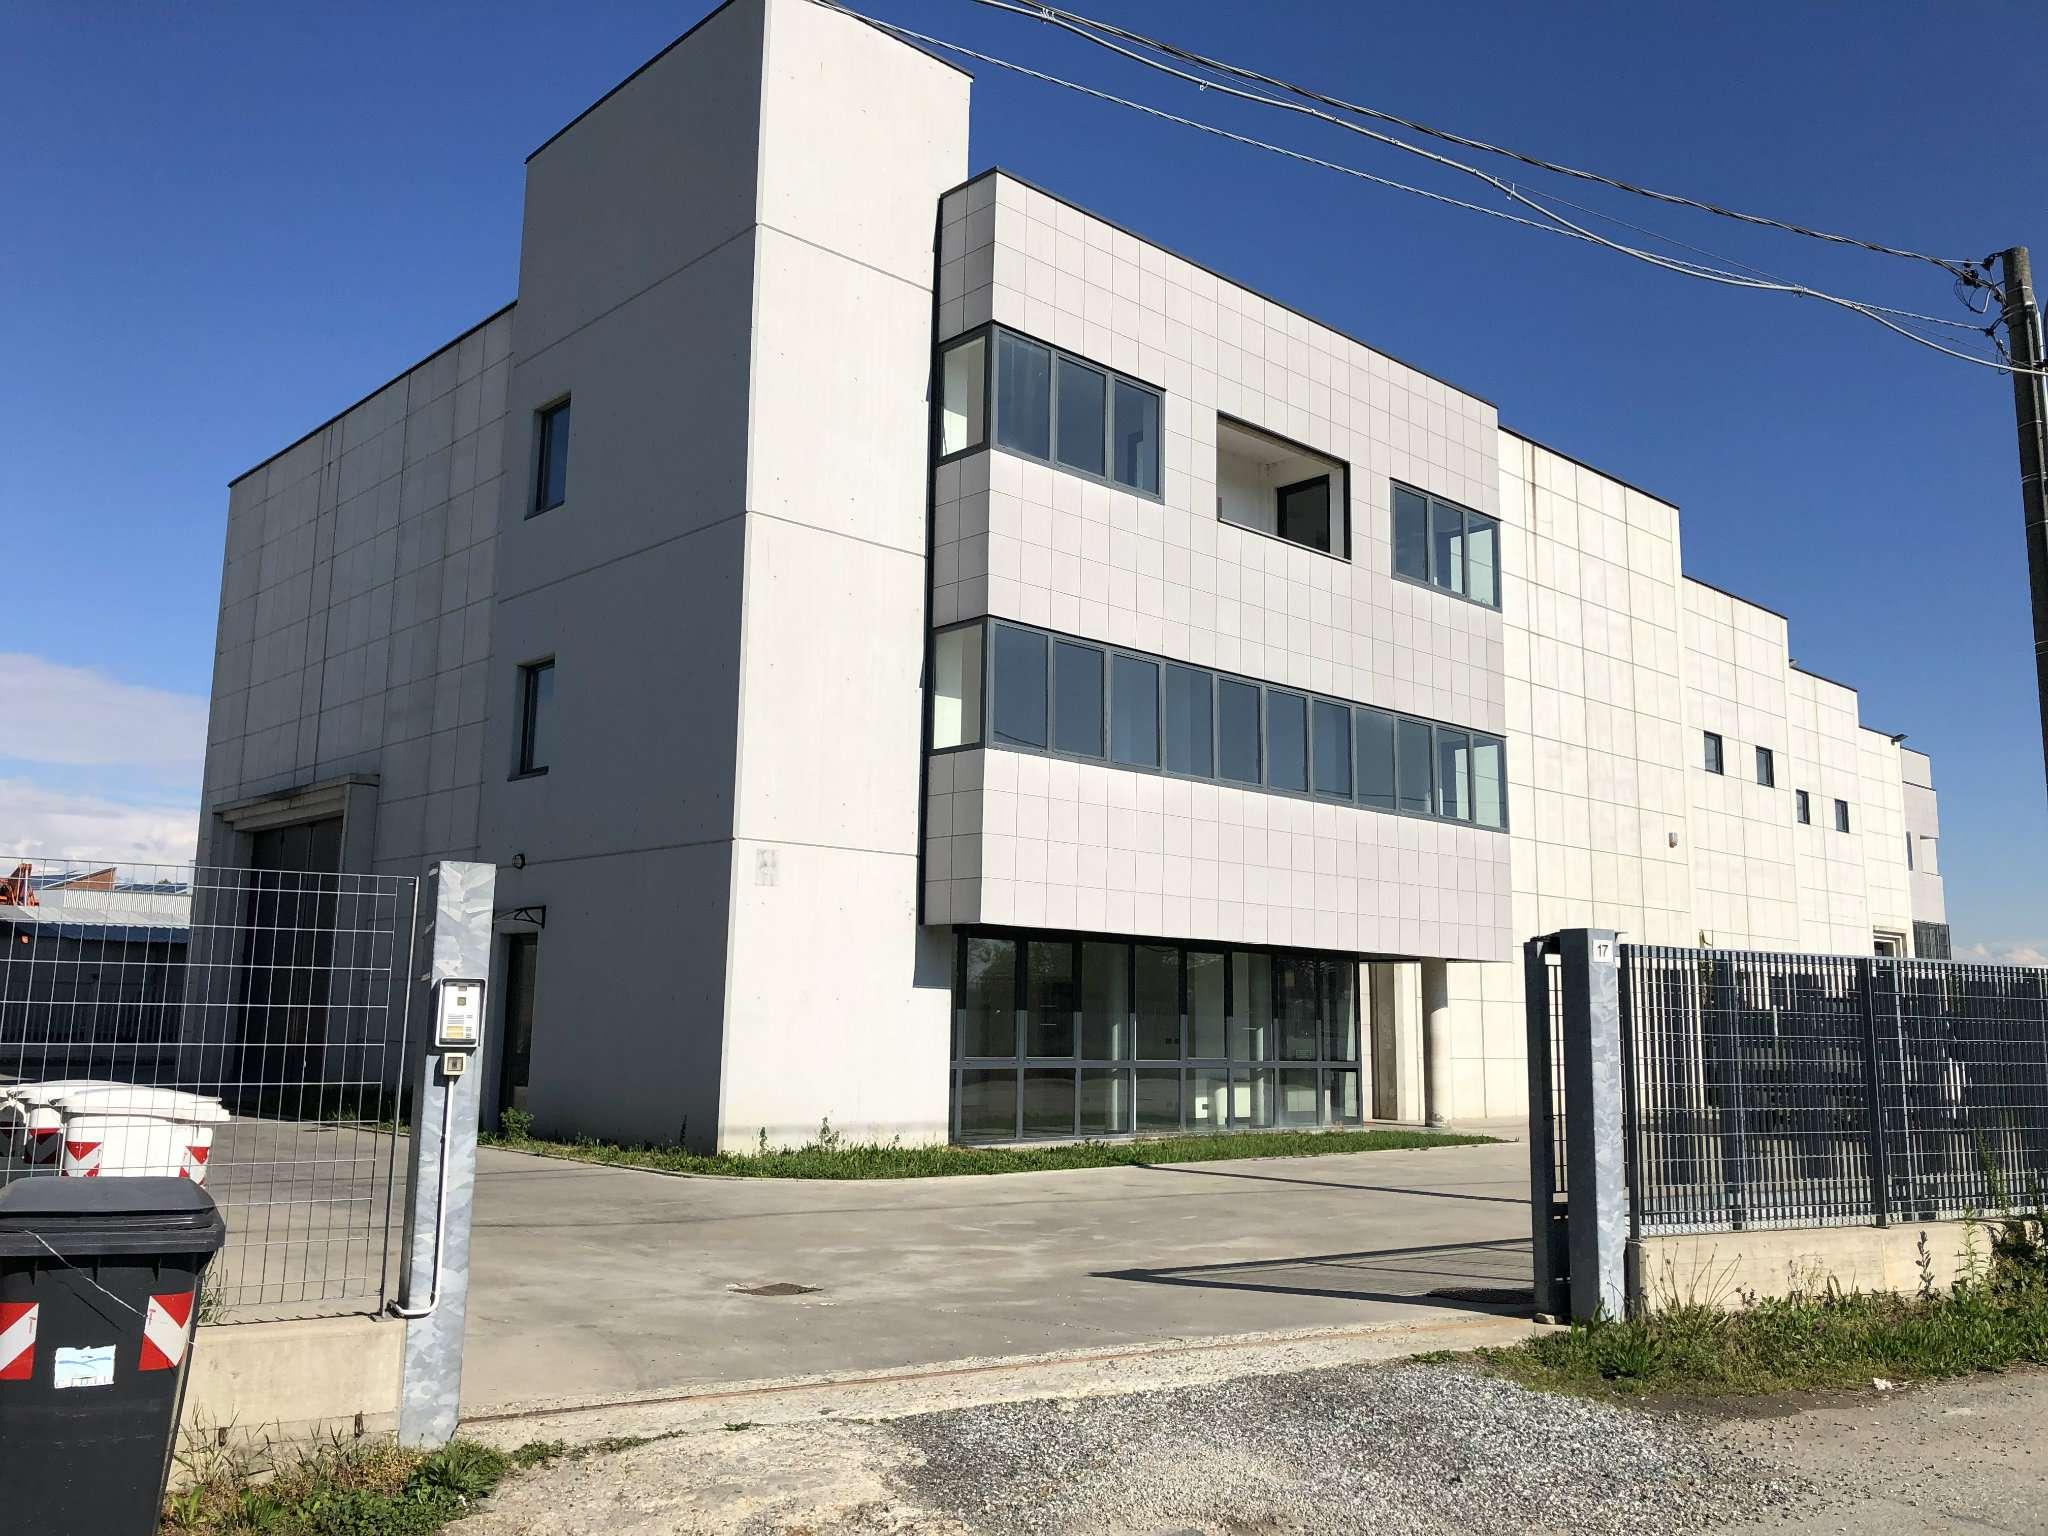 Capannone in vendita a Grugliasco, 9999 locali, Trattative riservate | PortaleAgenzieImmobiliari.it